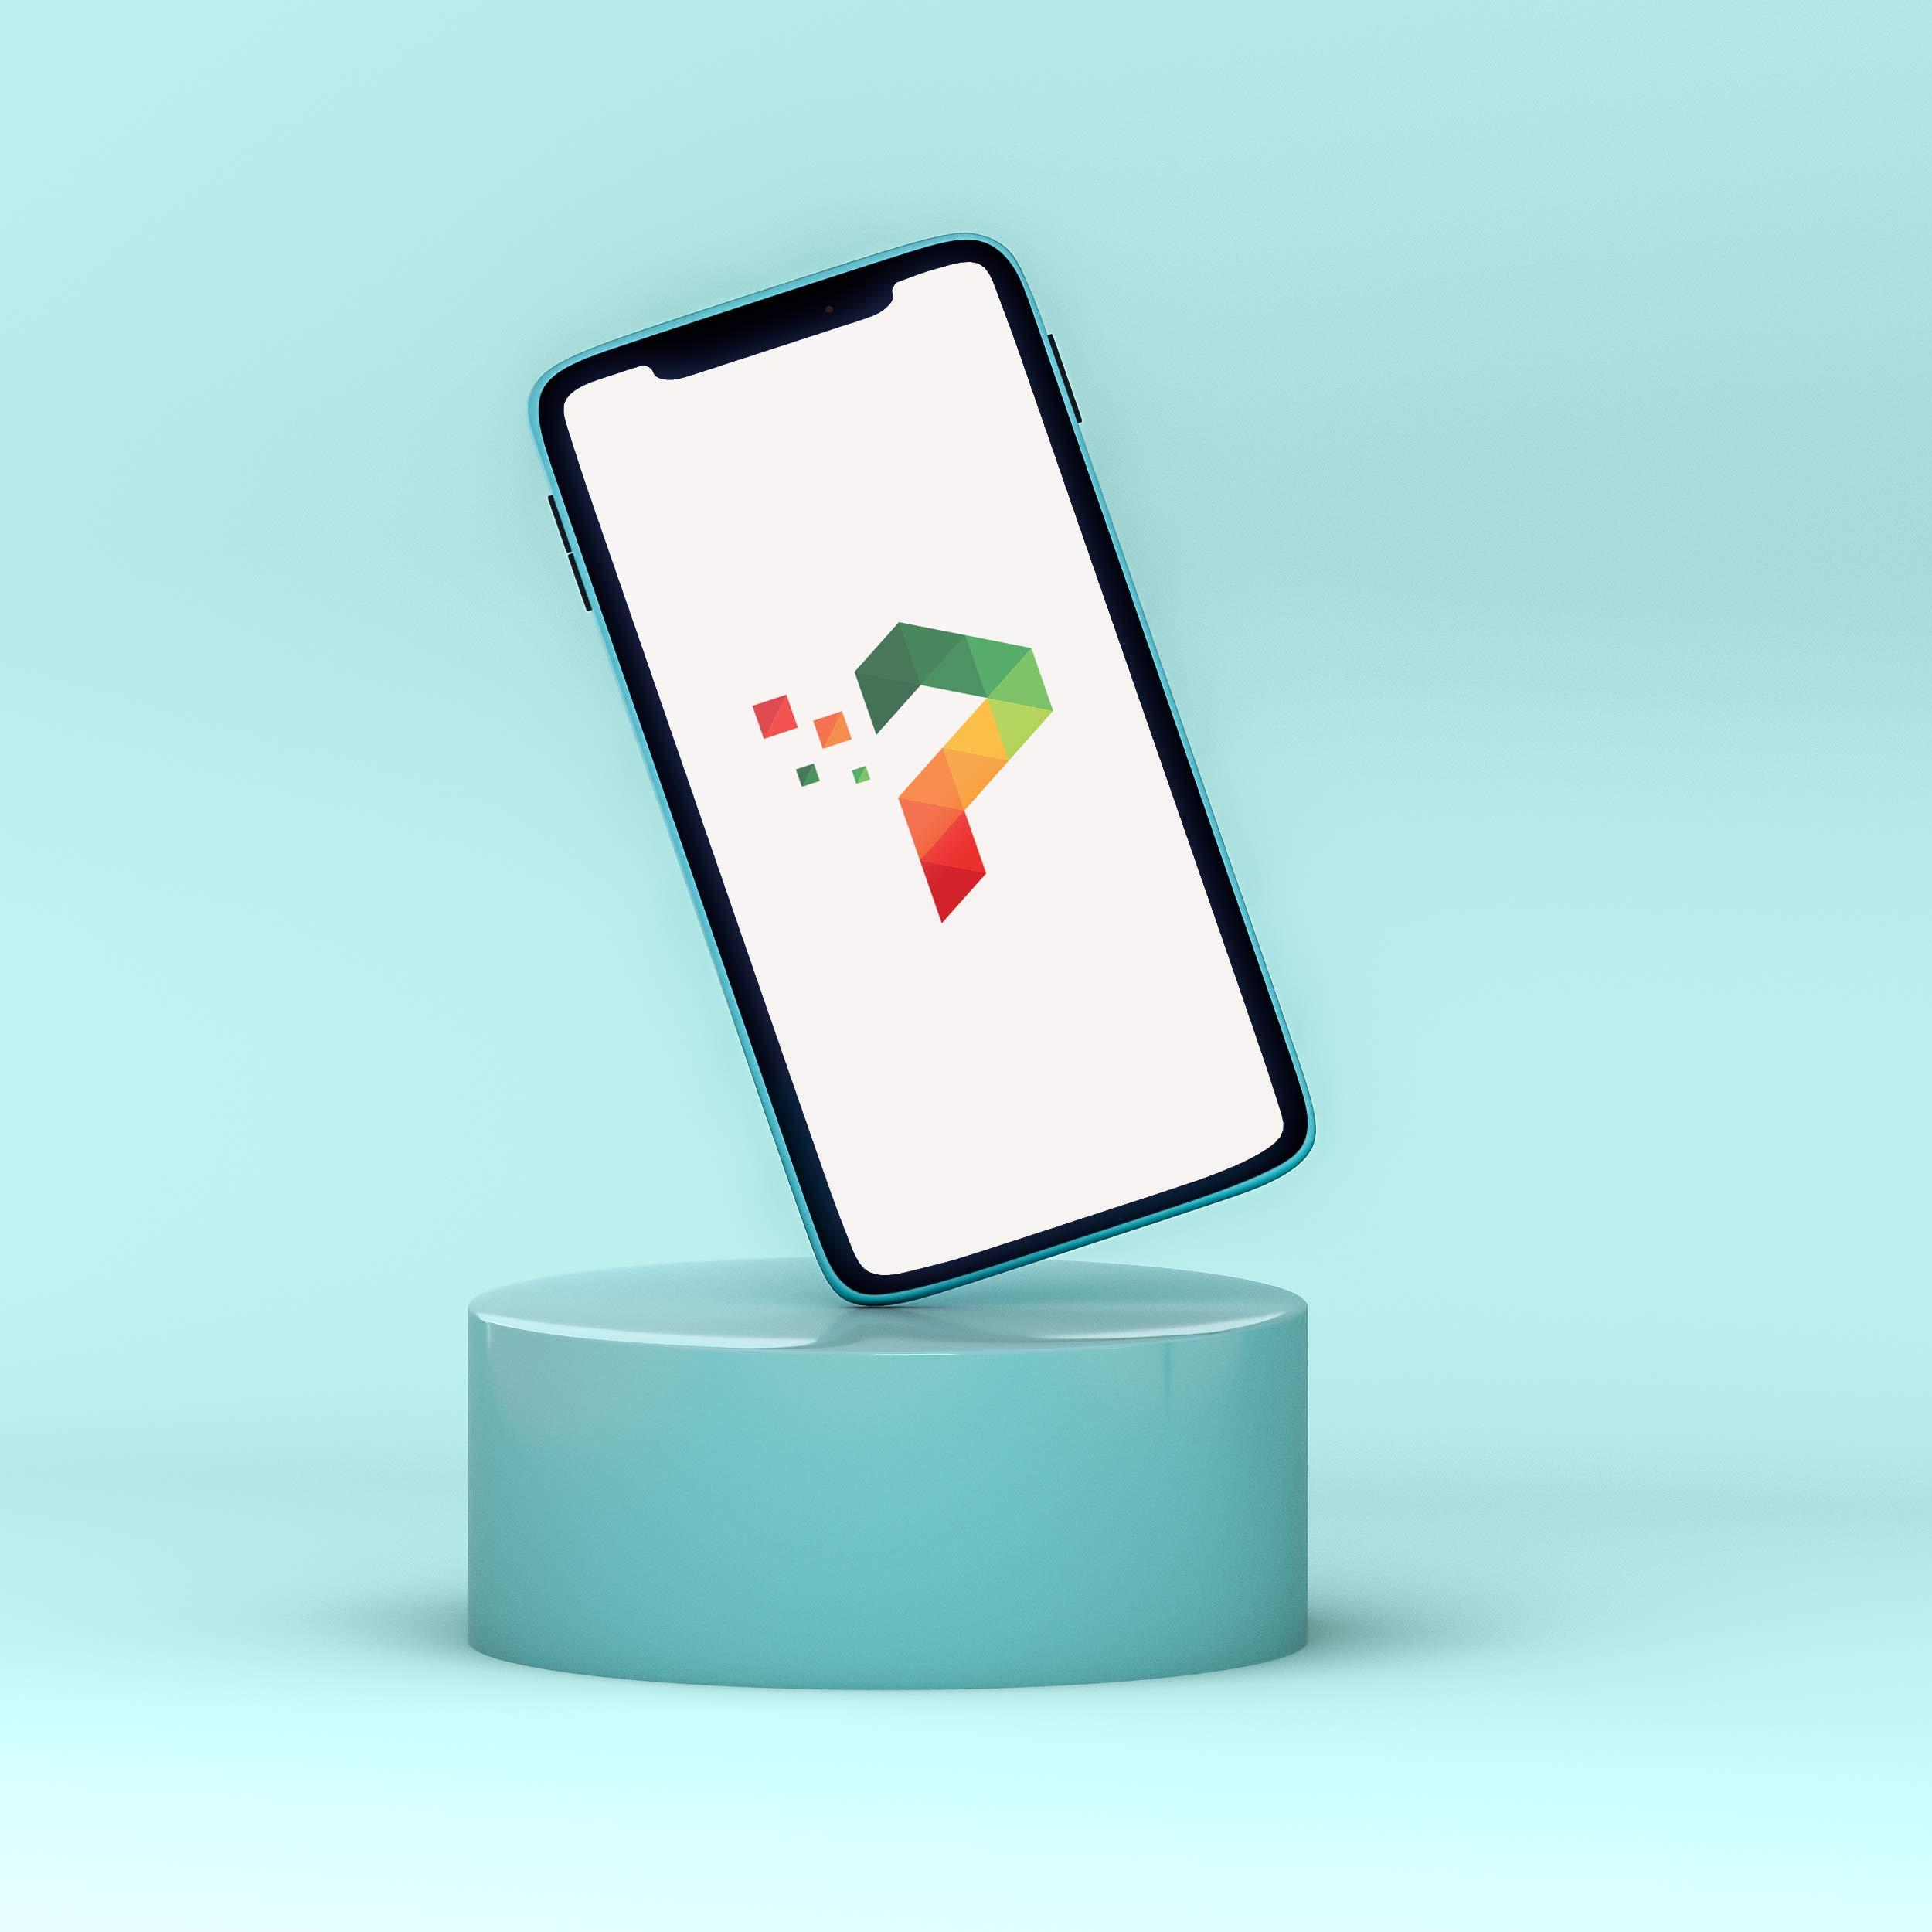 Social media post design application icon design by Badri design